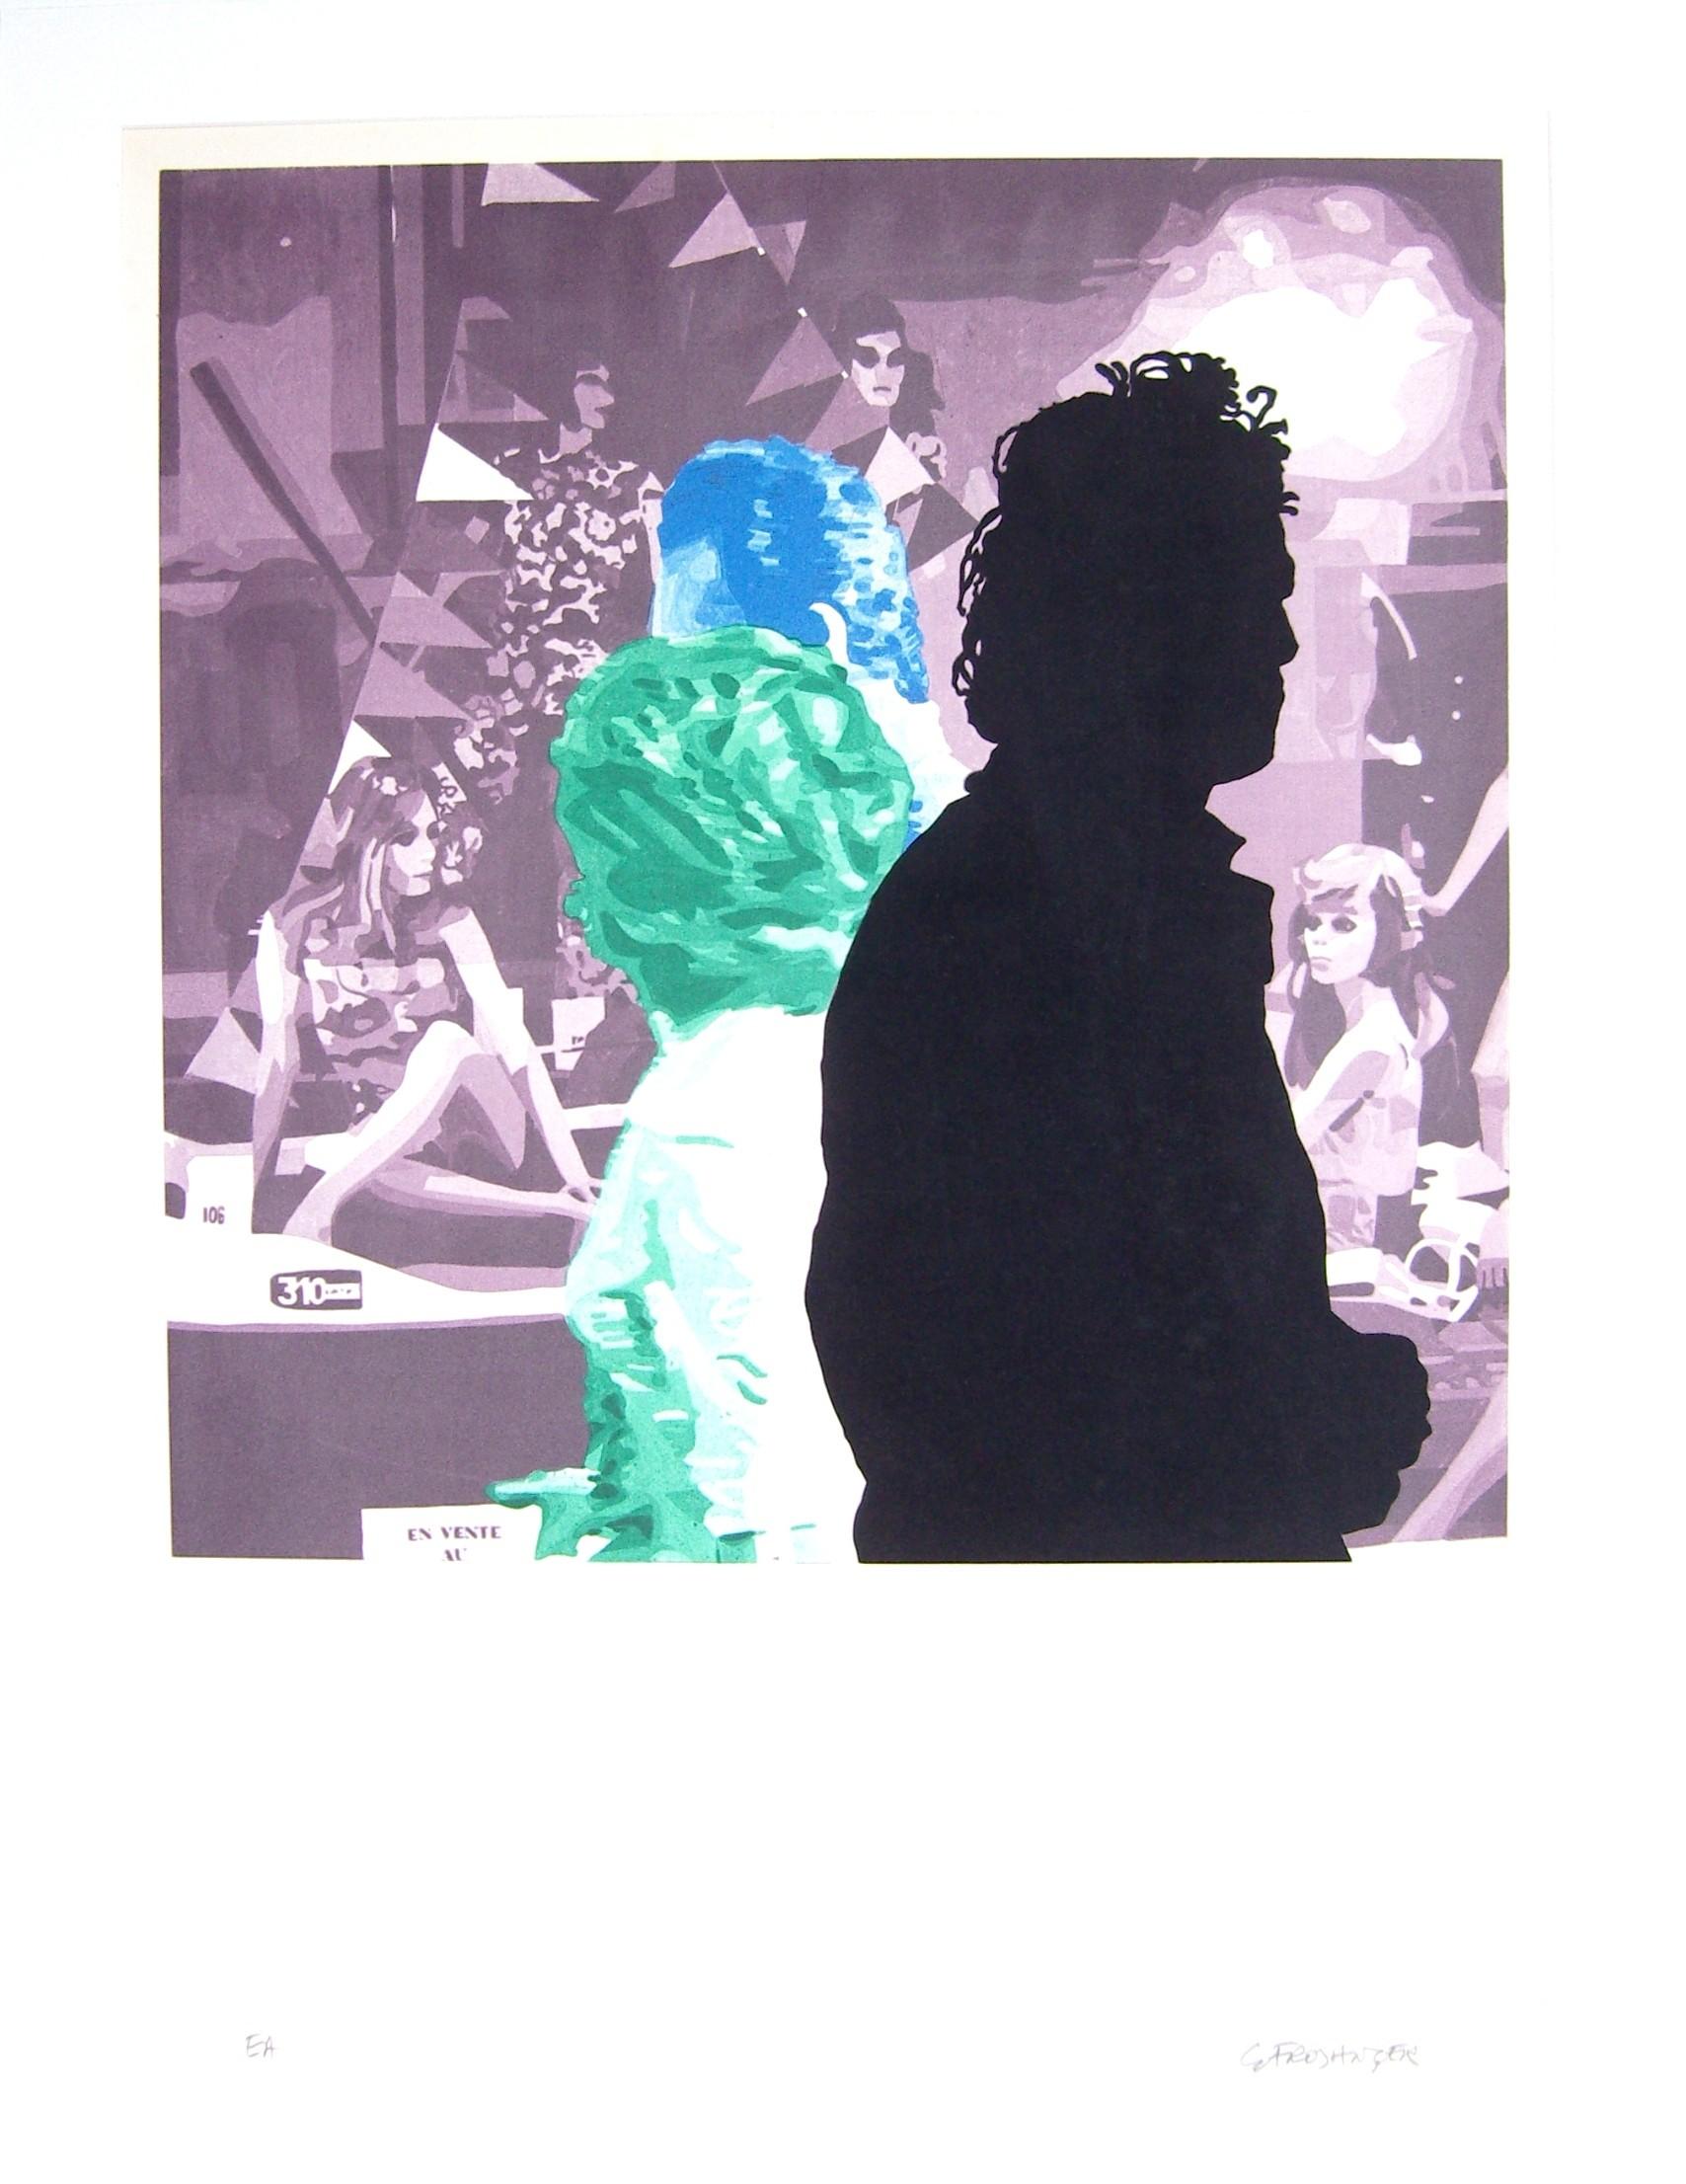 oeuvre peintre et mod le violet de mars ii par fromanger g rard. Black Bedroom Furniture Sets. Home Design Ideas